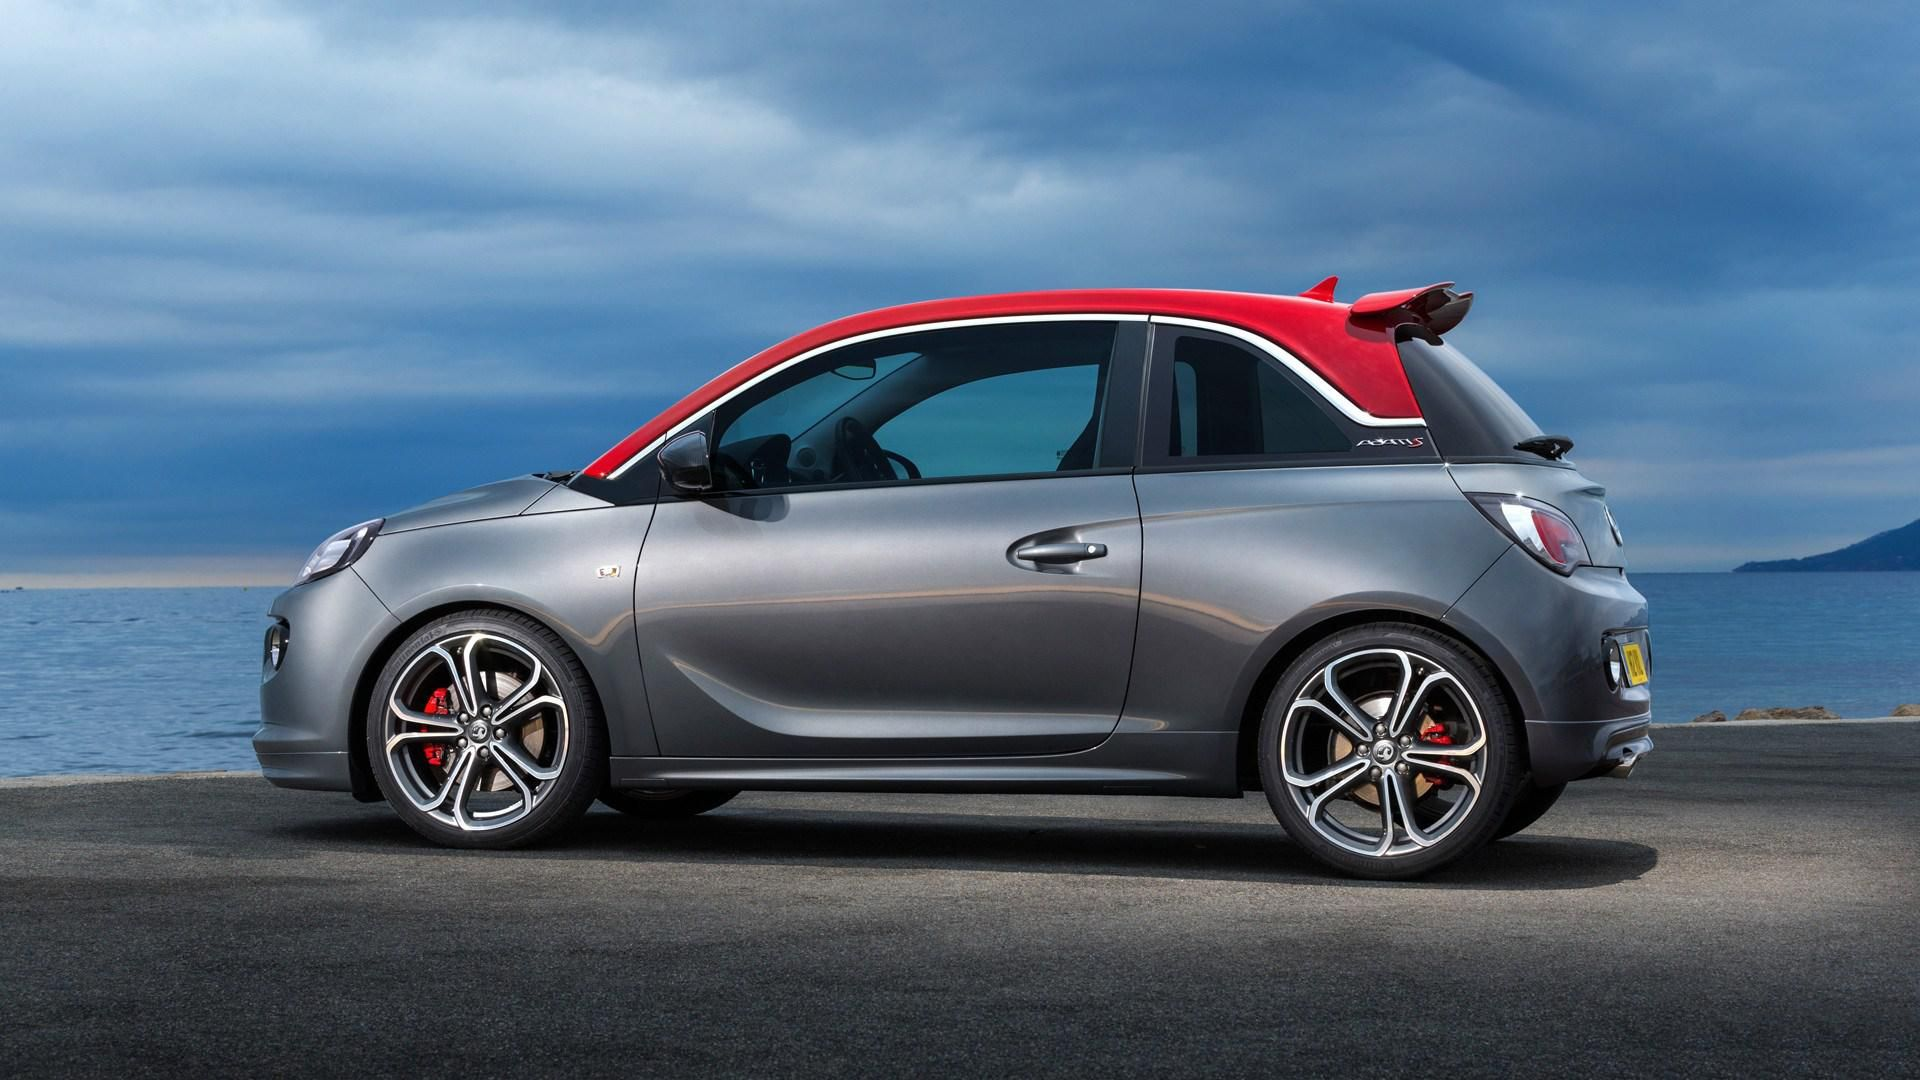 Opel Adam Rocks Wallpaper HD Httpwallsautocomopeladam - Small sports cars 2015